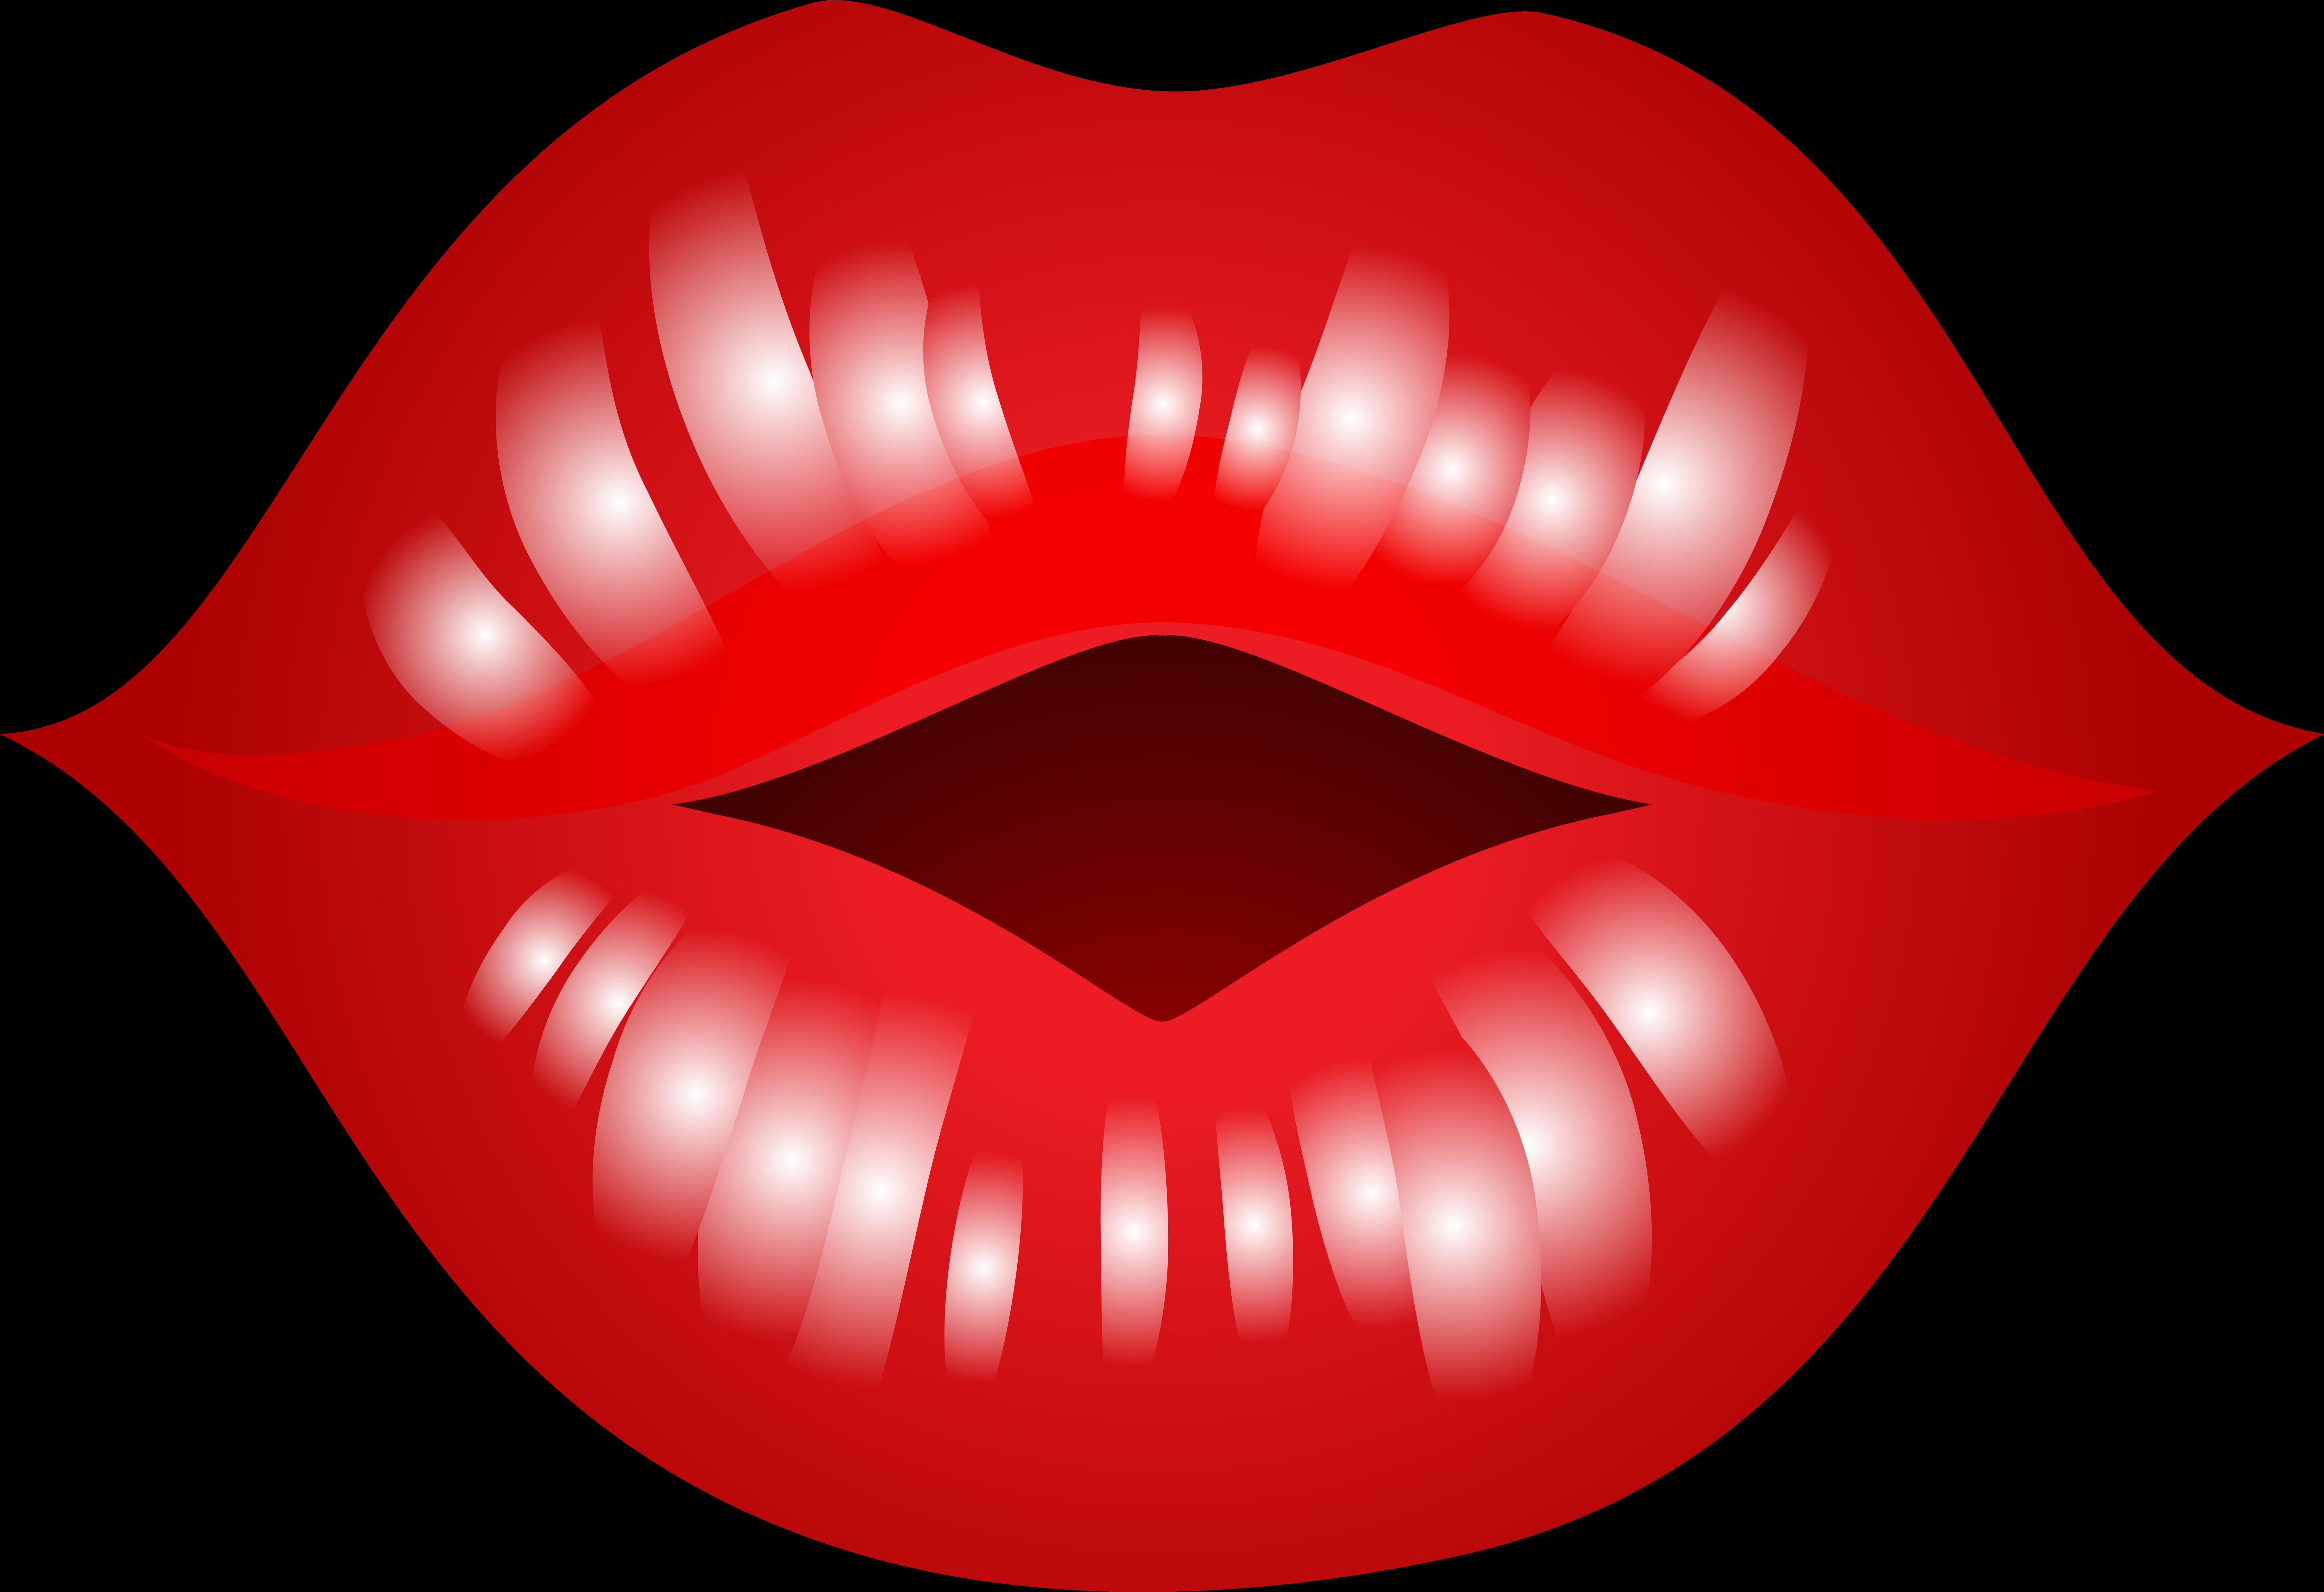 Kissing Lips Clipart.